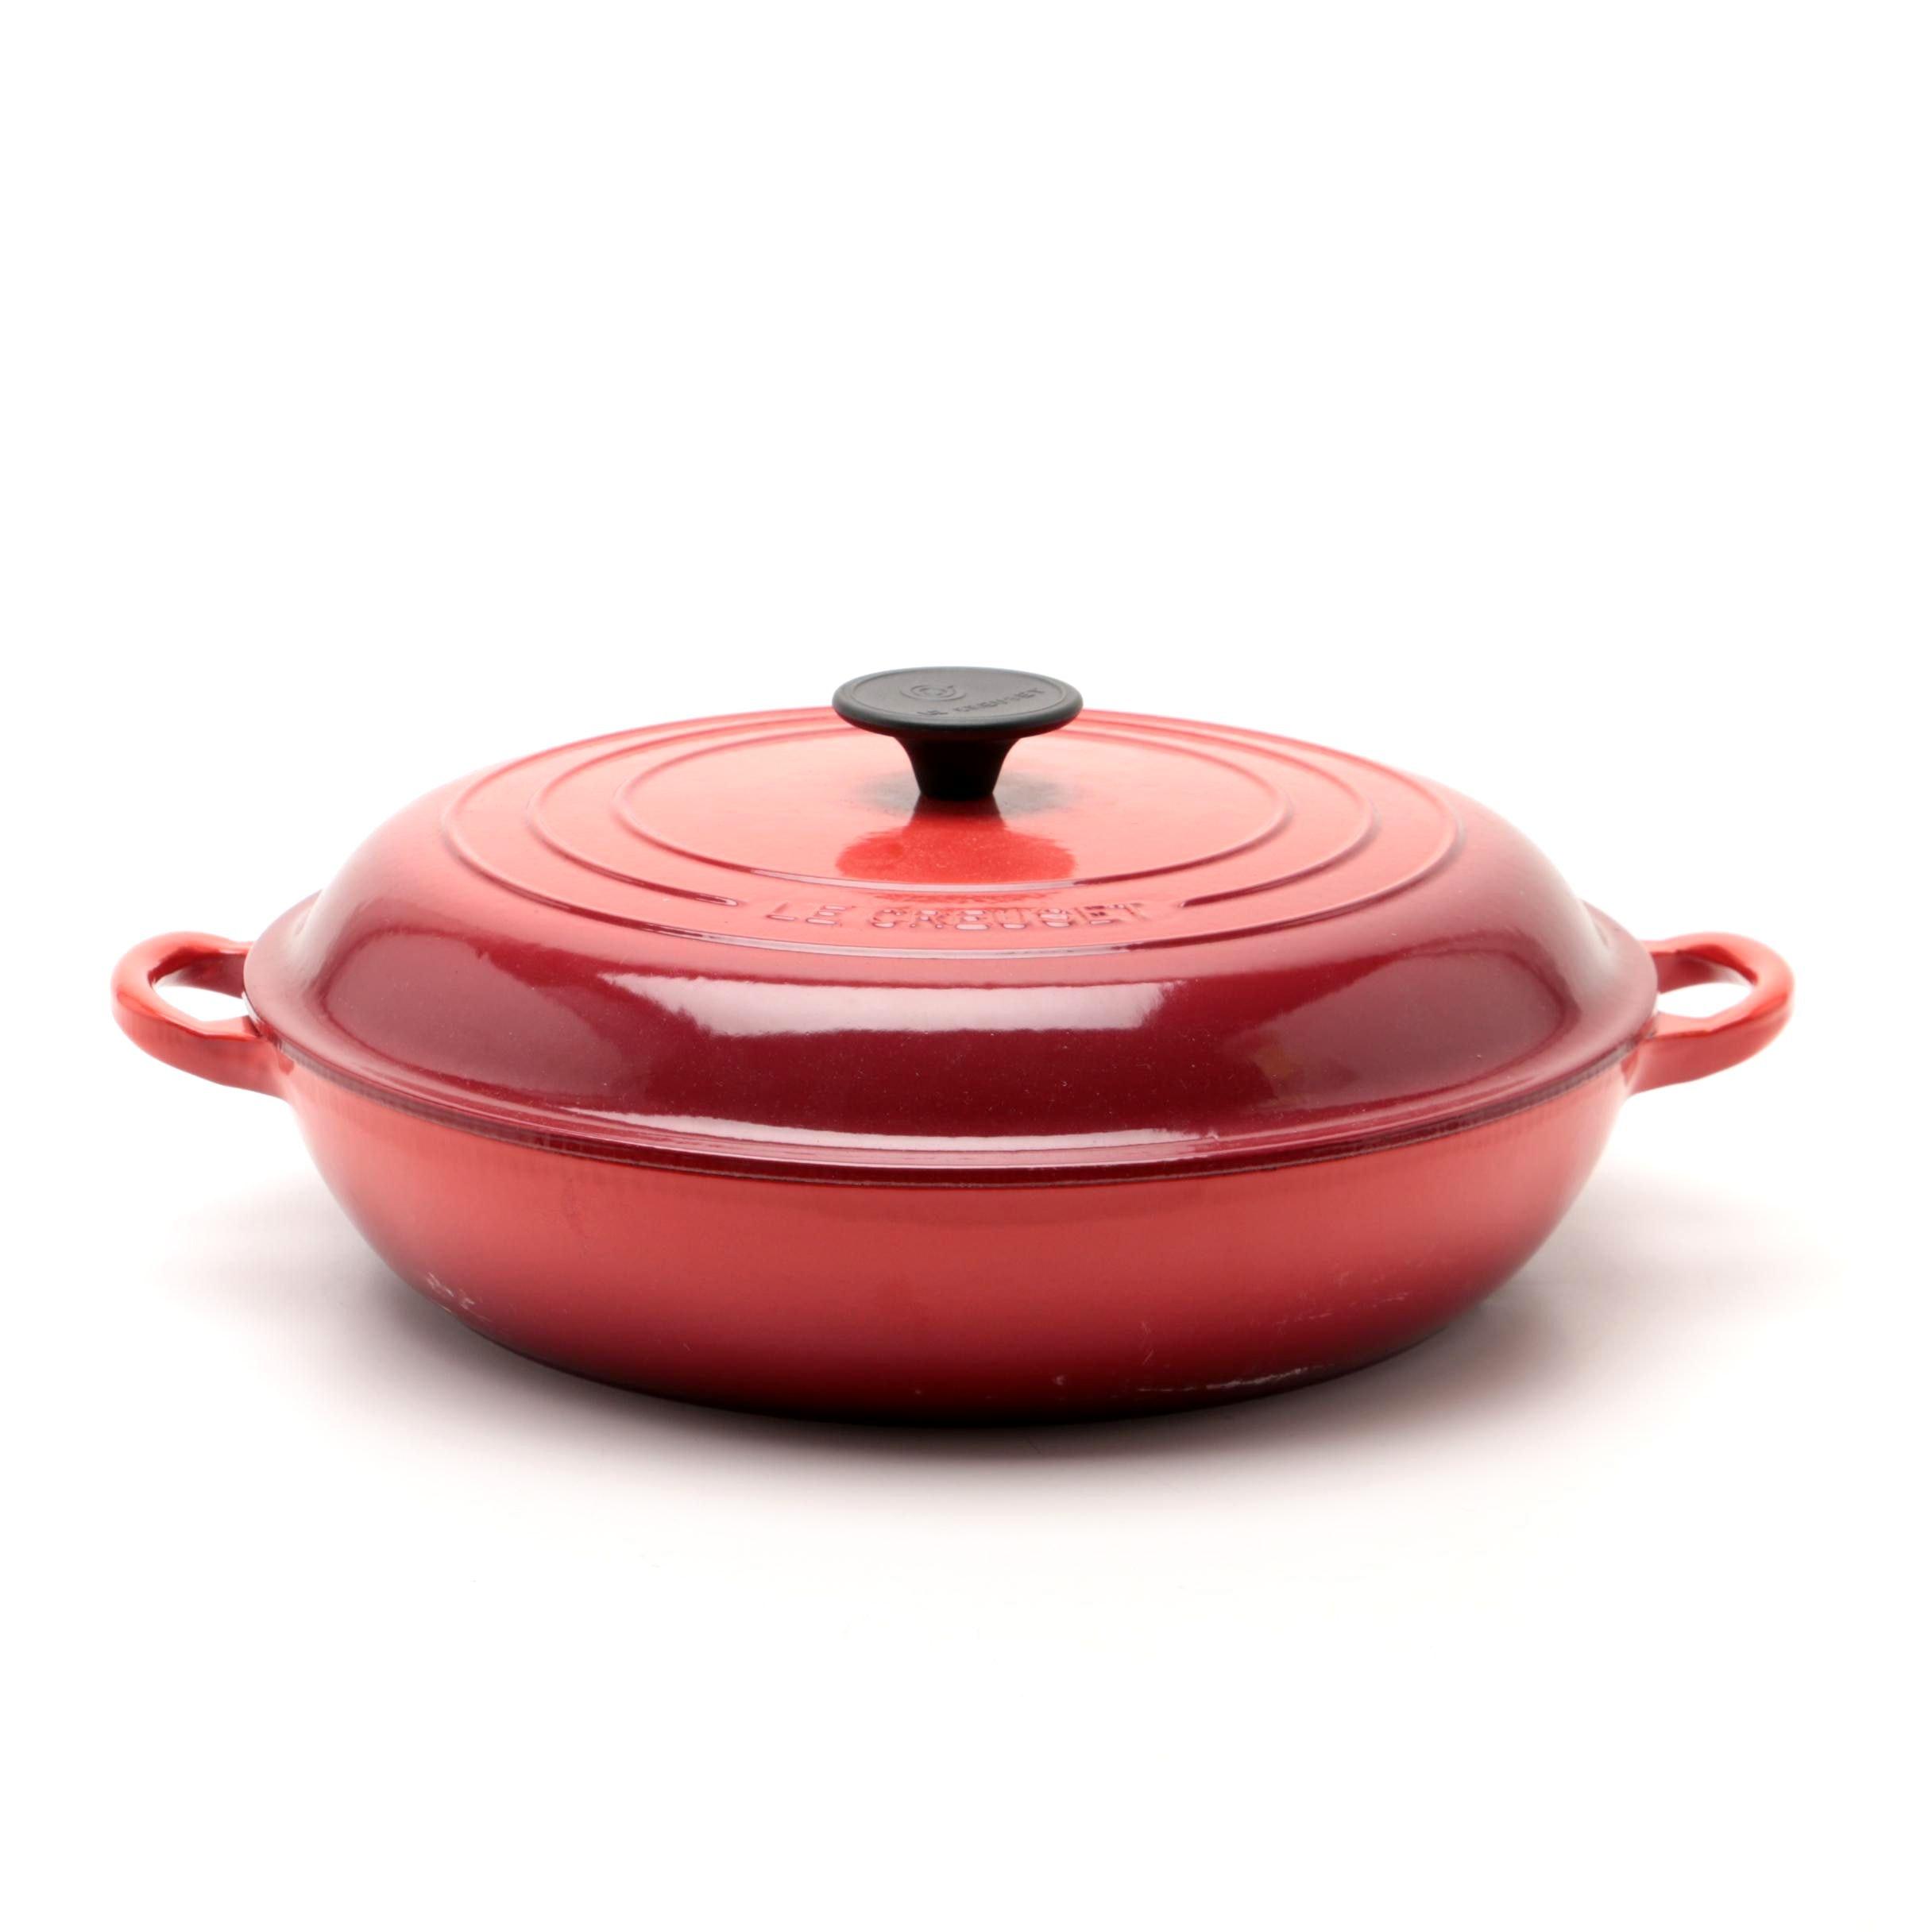 Le Creuset Enameled Cast Iron Lidded Casserole Dish